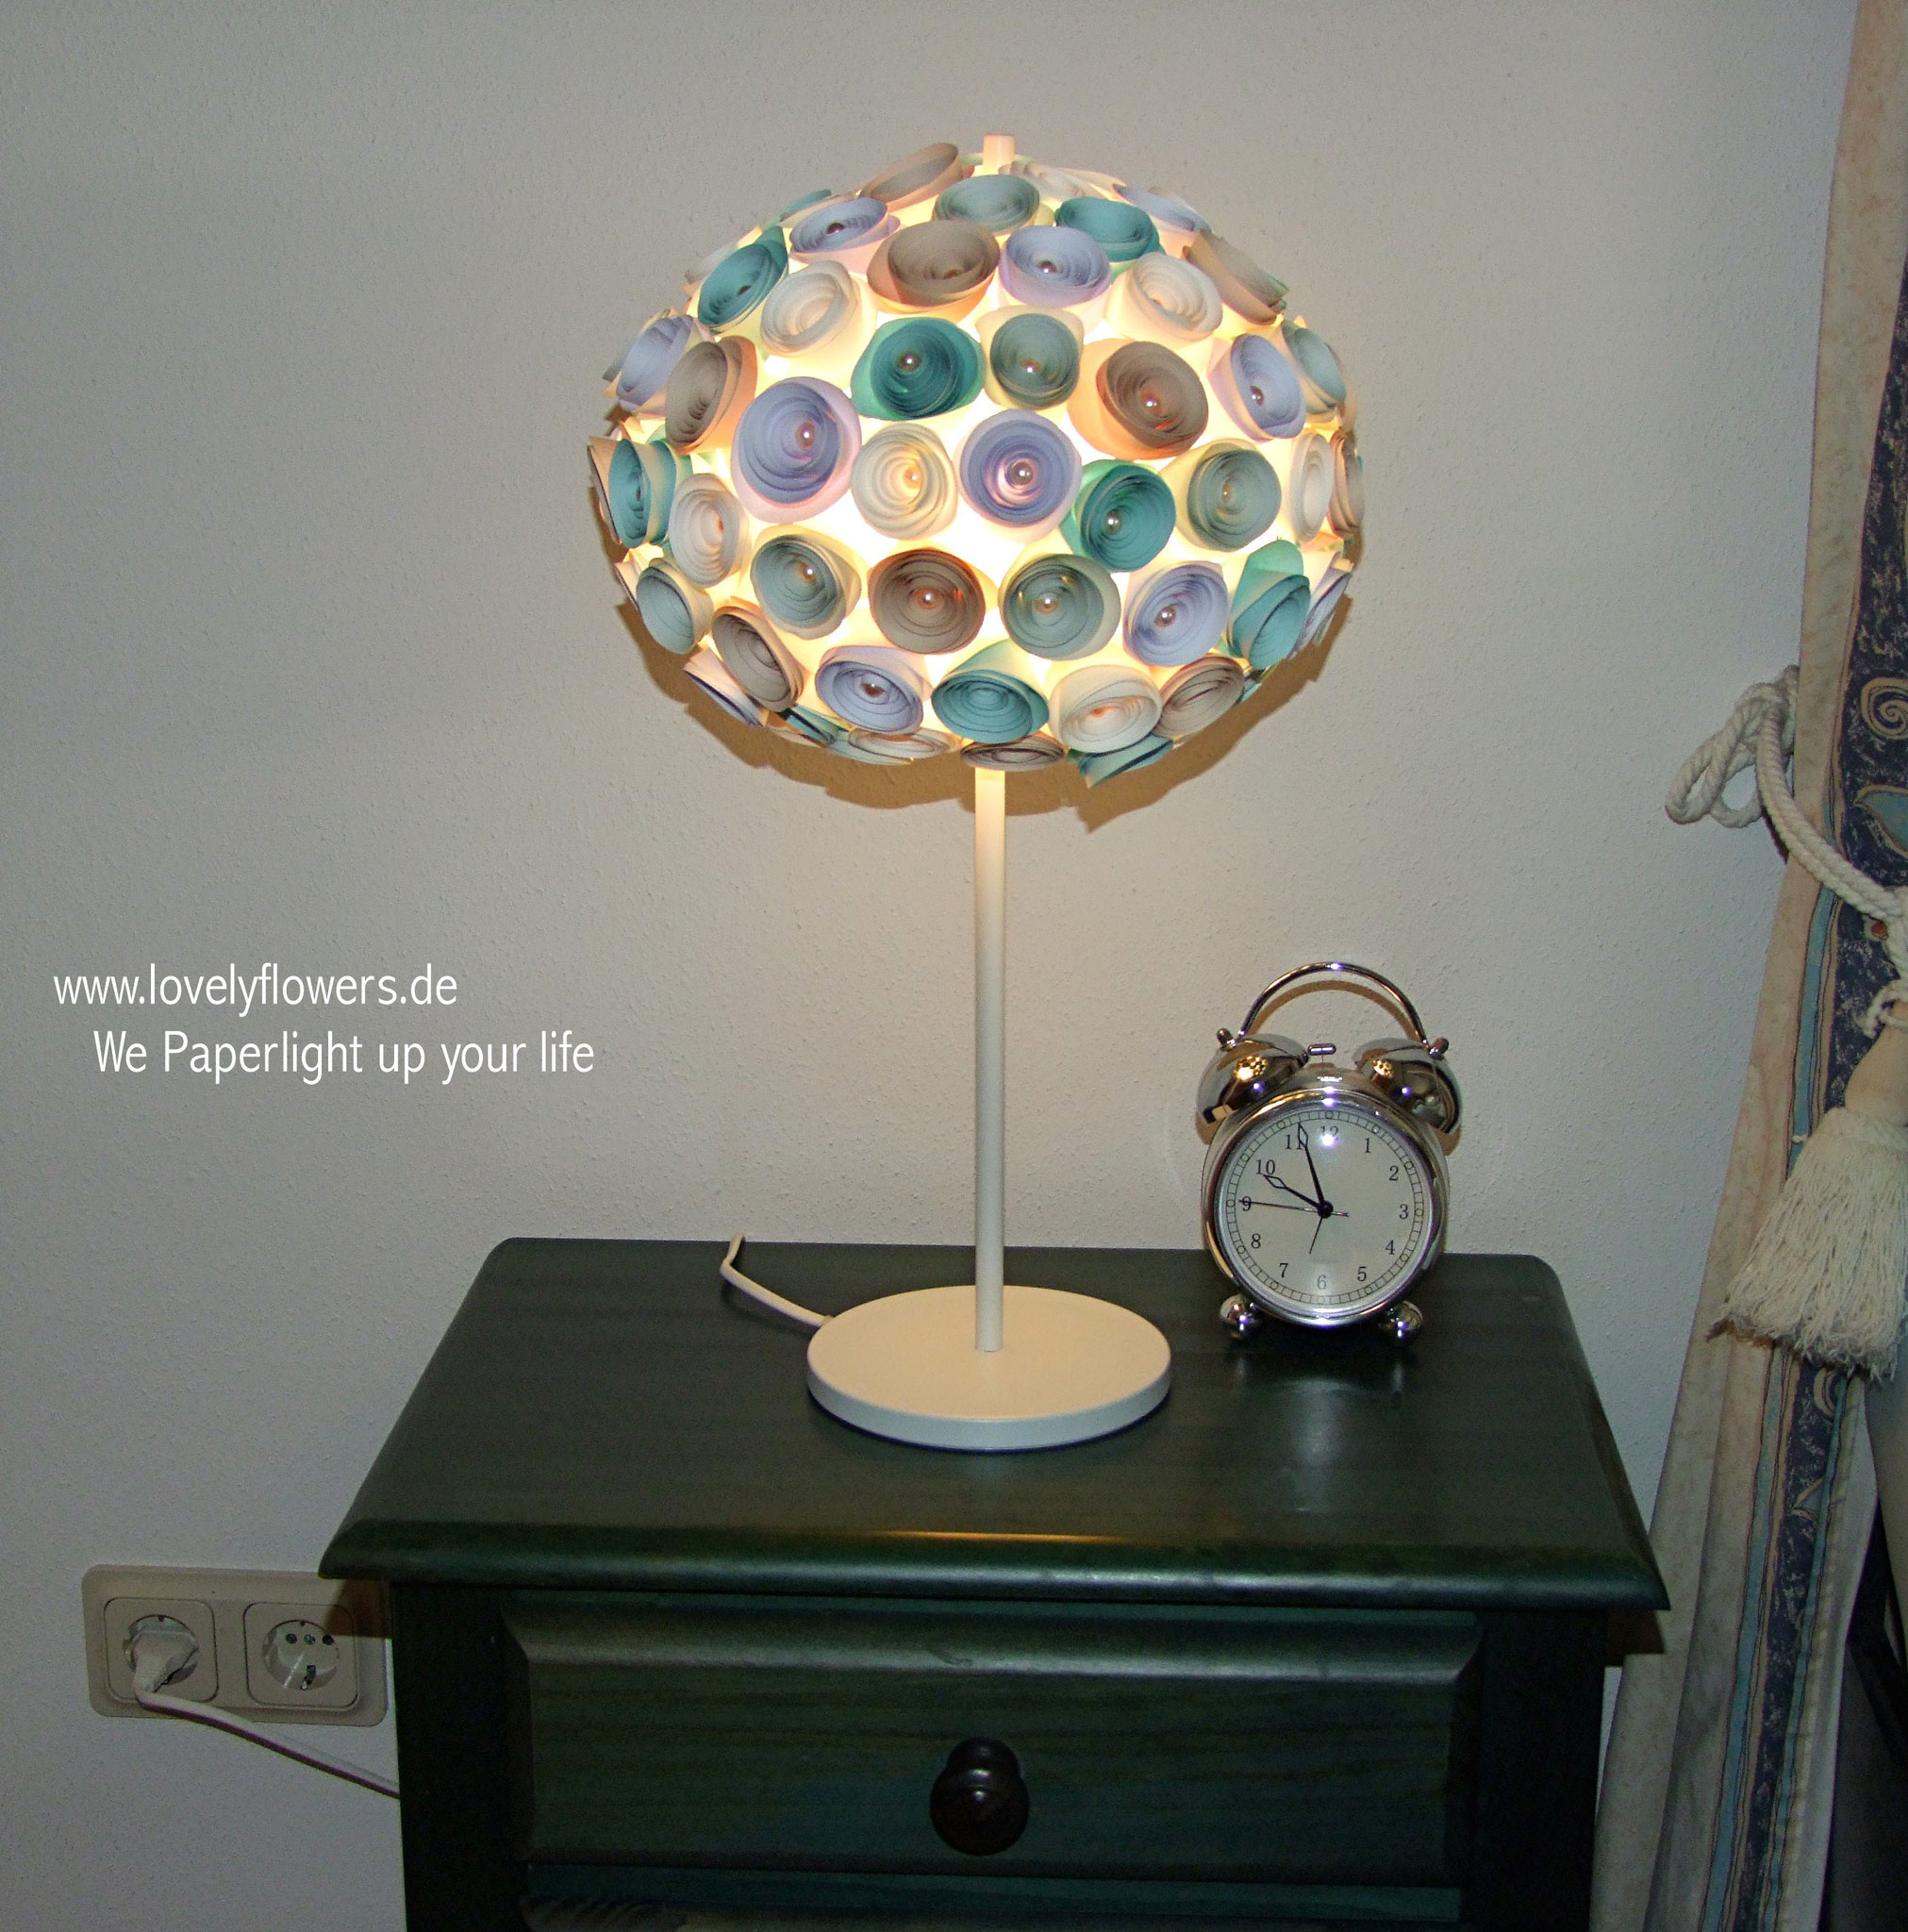 www.lovelyflowers.de - Paper Art Lampen machen Dein Schlafzimmer am Abend kuschelig!